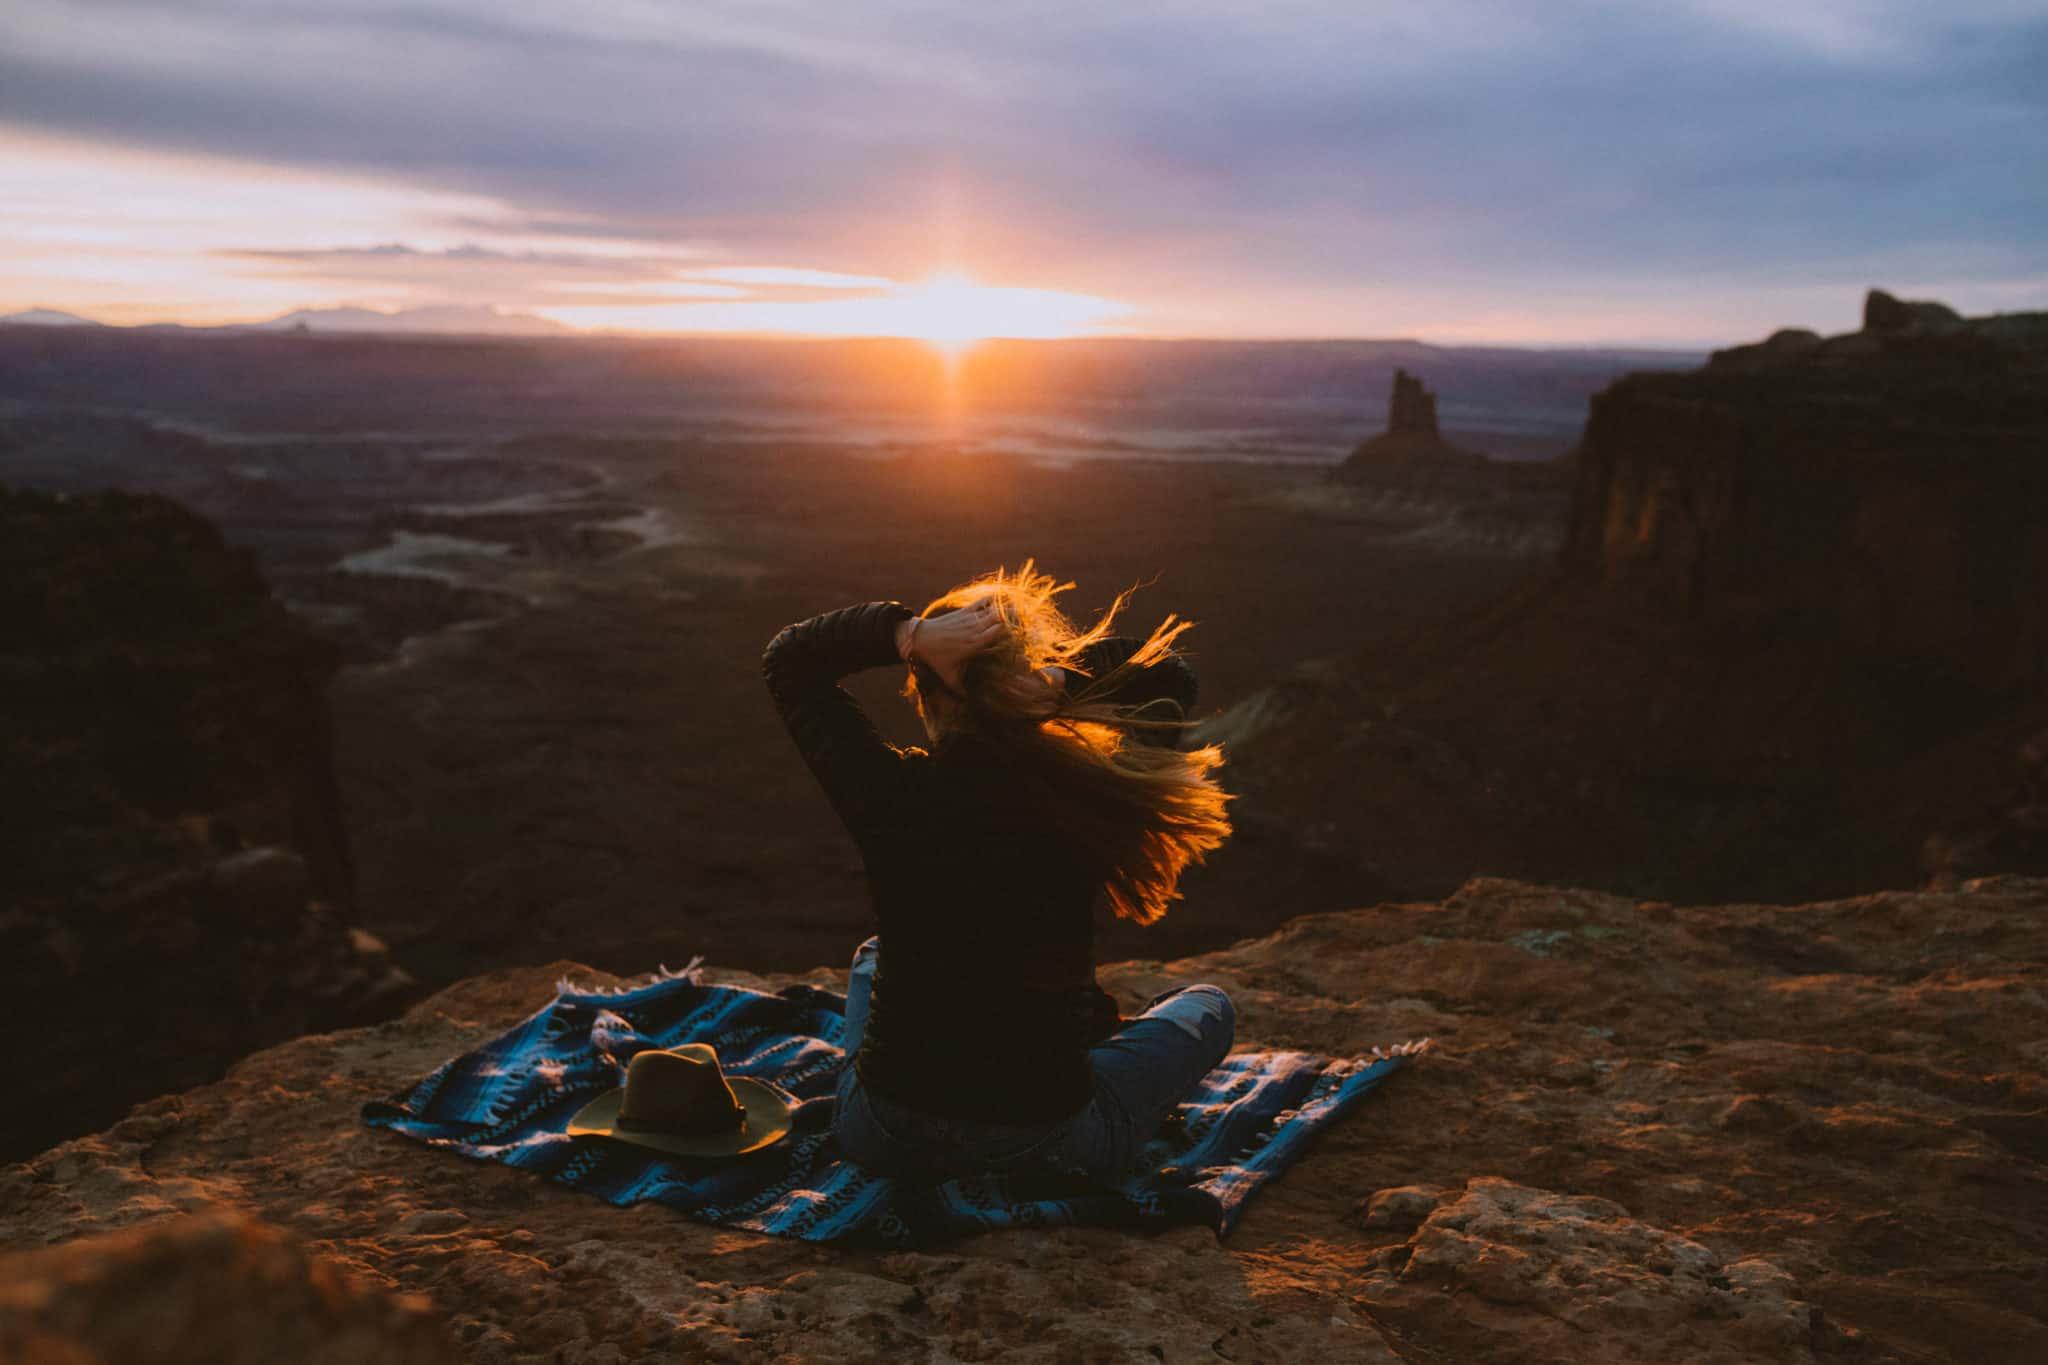 American Southwest Road Trip Destinations - Canyonlands